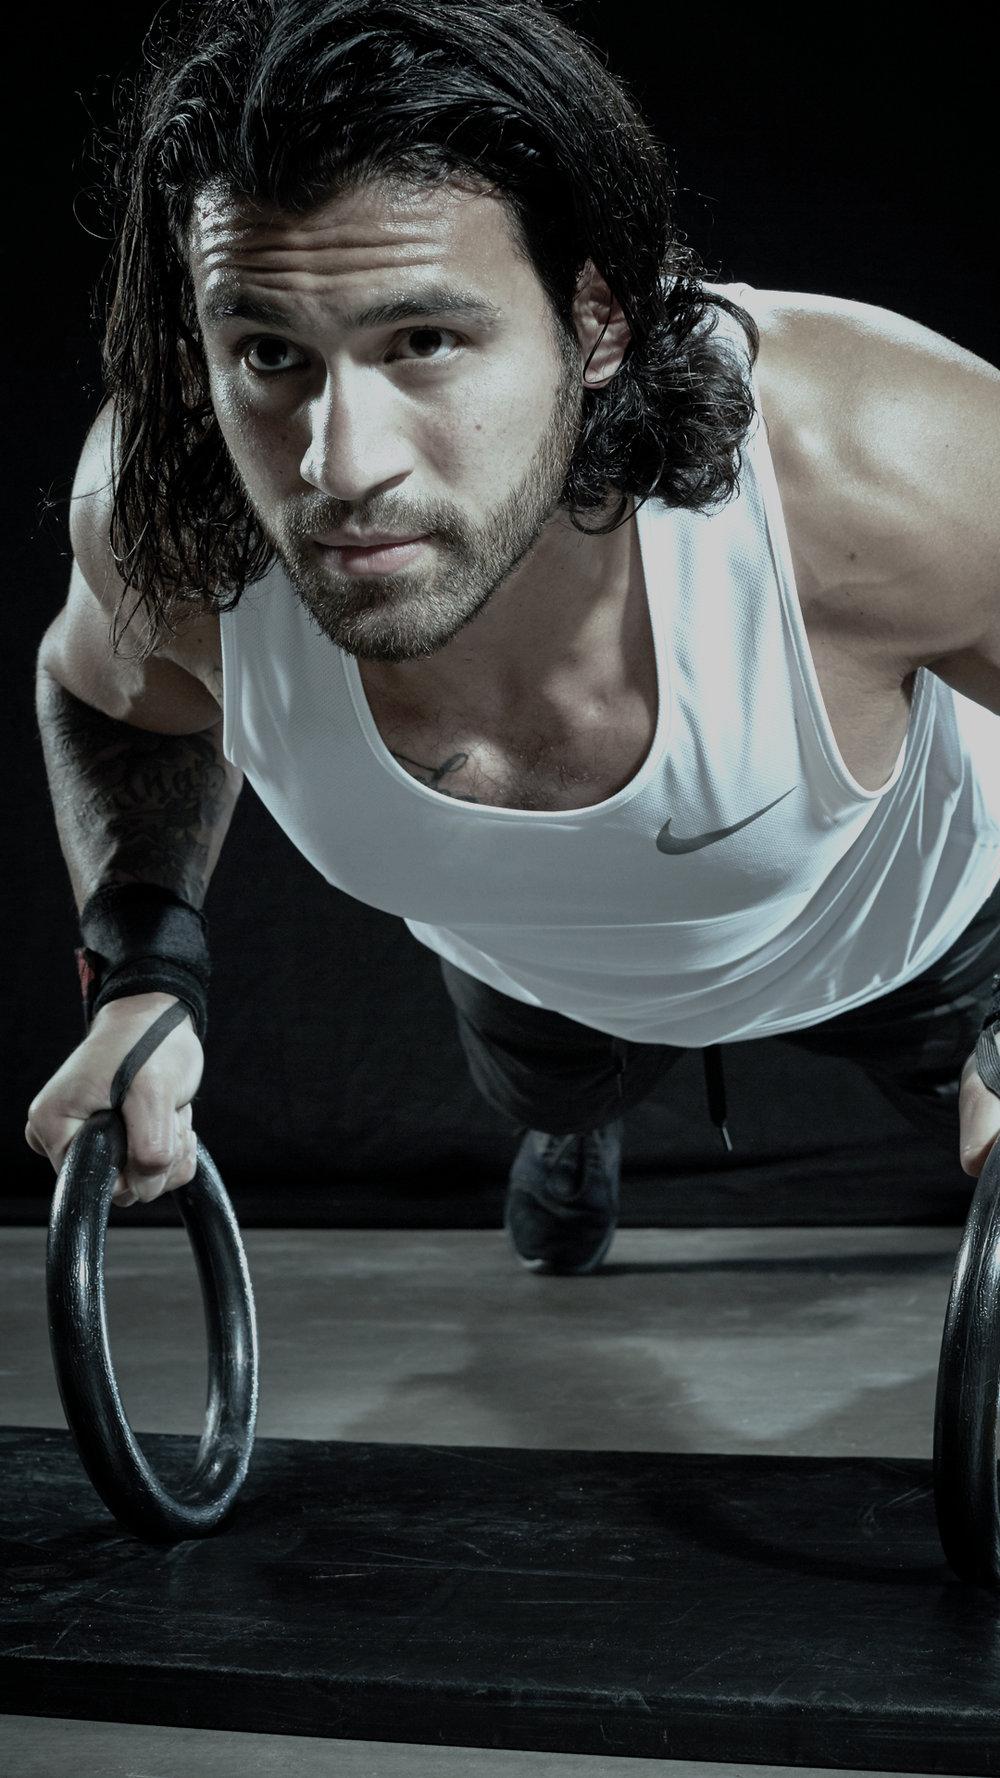 Gym_Box_VPTs_Part_ii_Farringdon_Mikey_Herrera_Graded.jpg